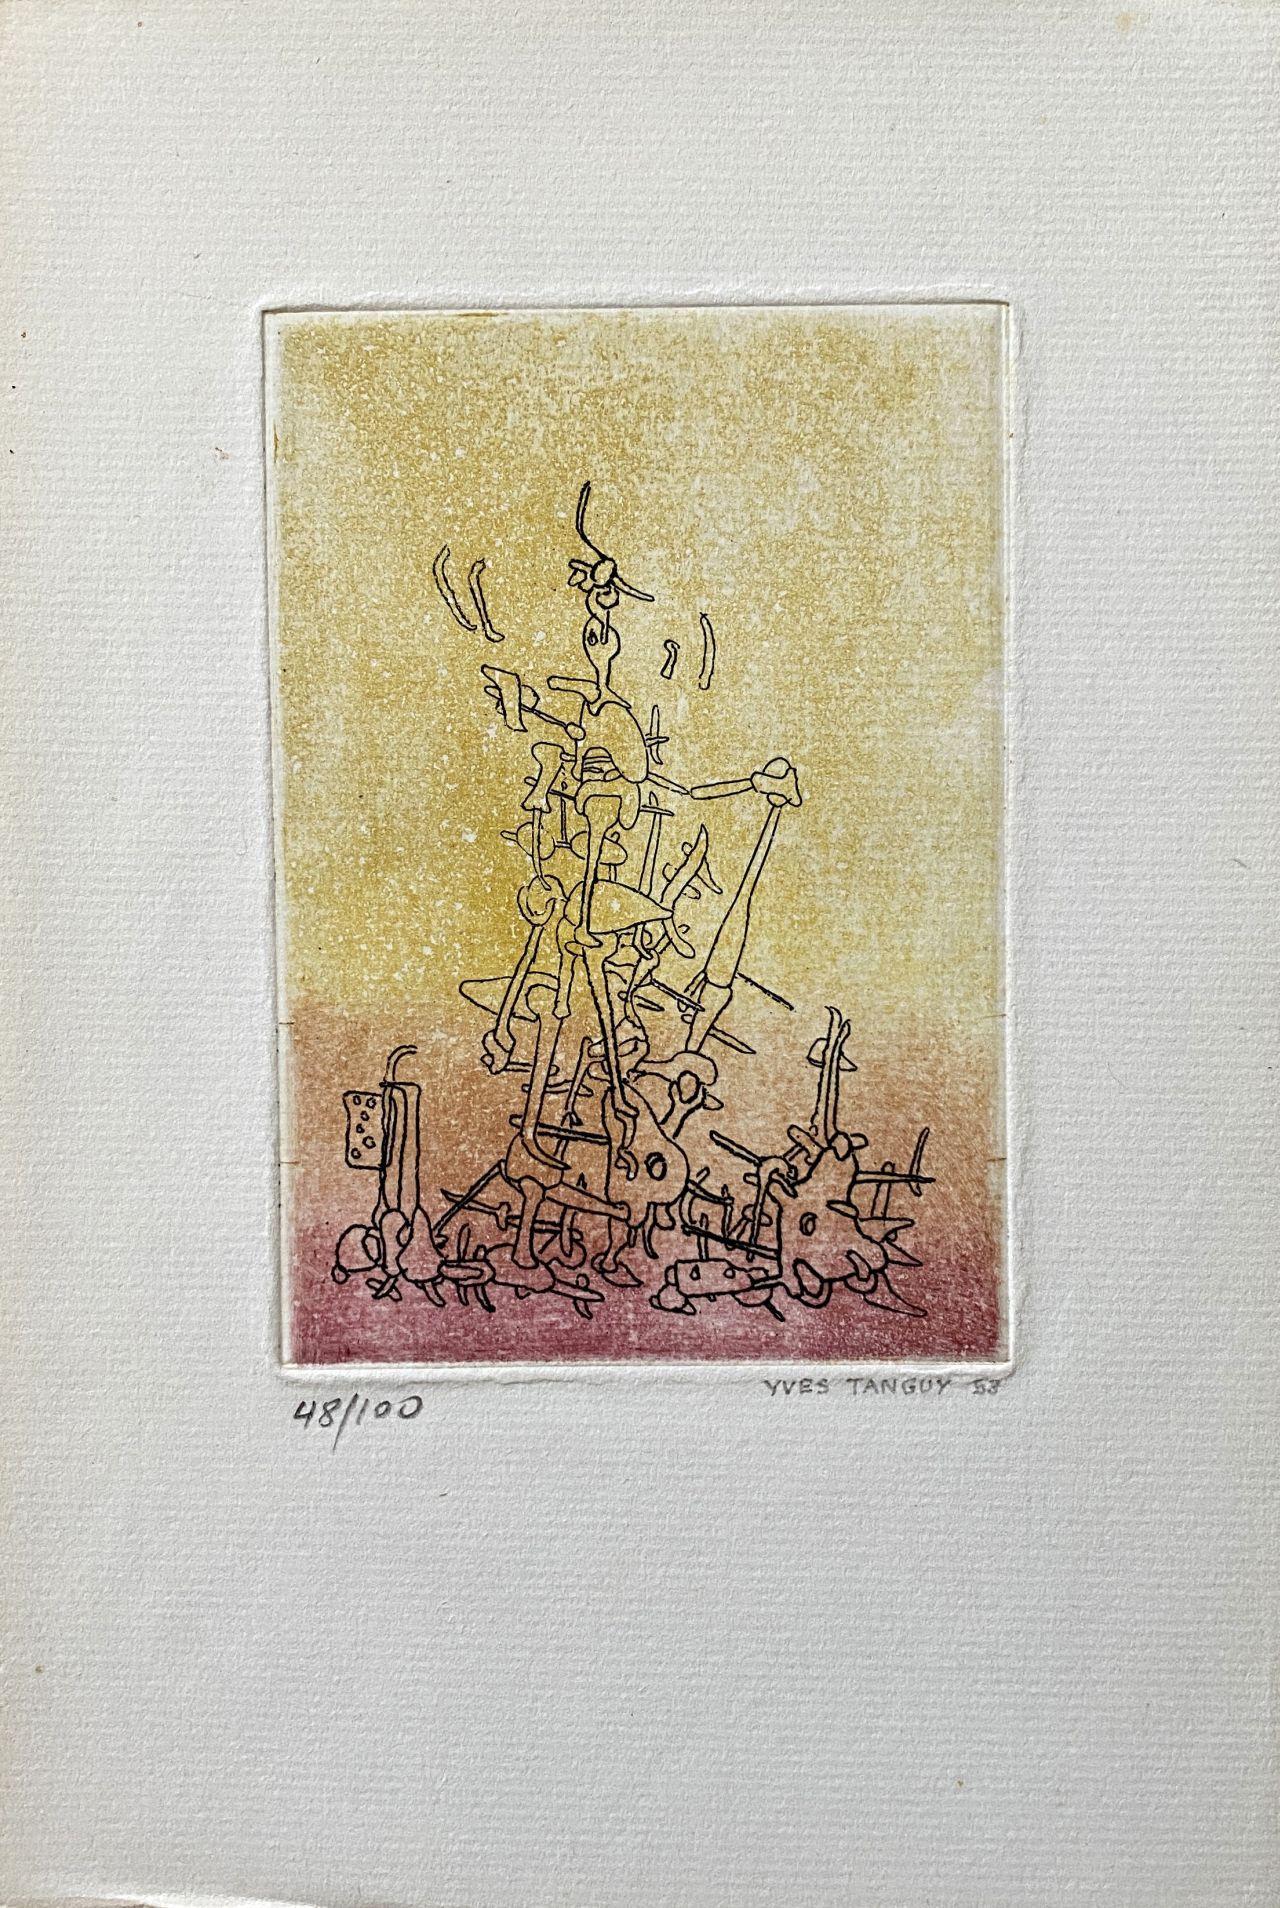 Untitled - Original Etching Handsigned Numbered /100 - Wittrock 18